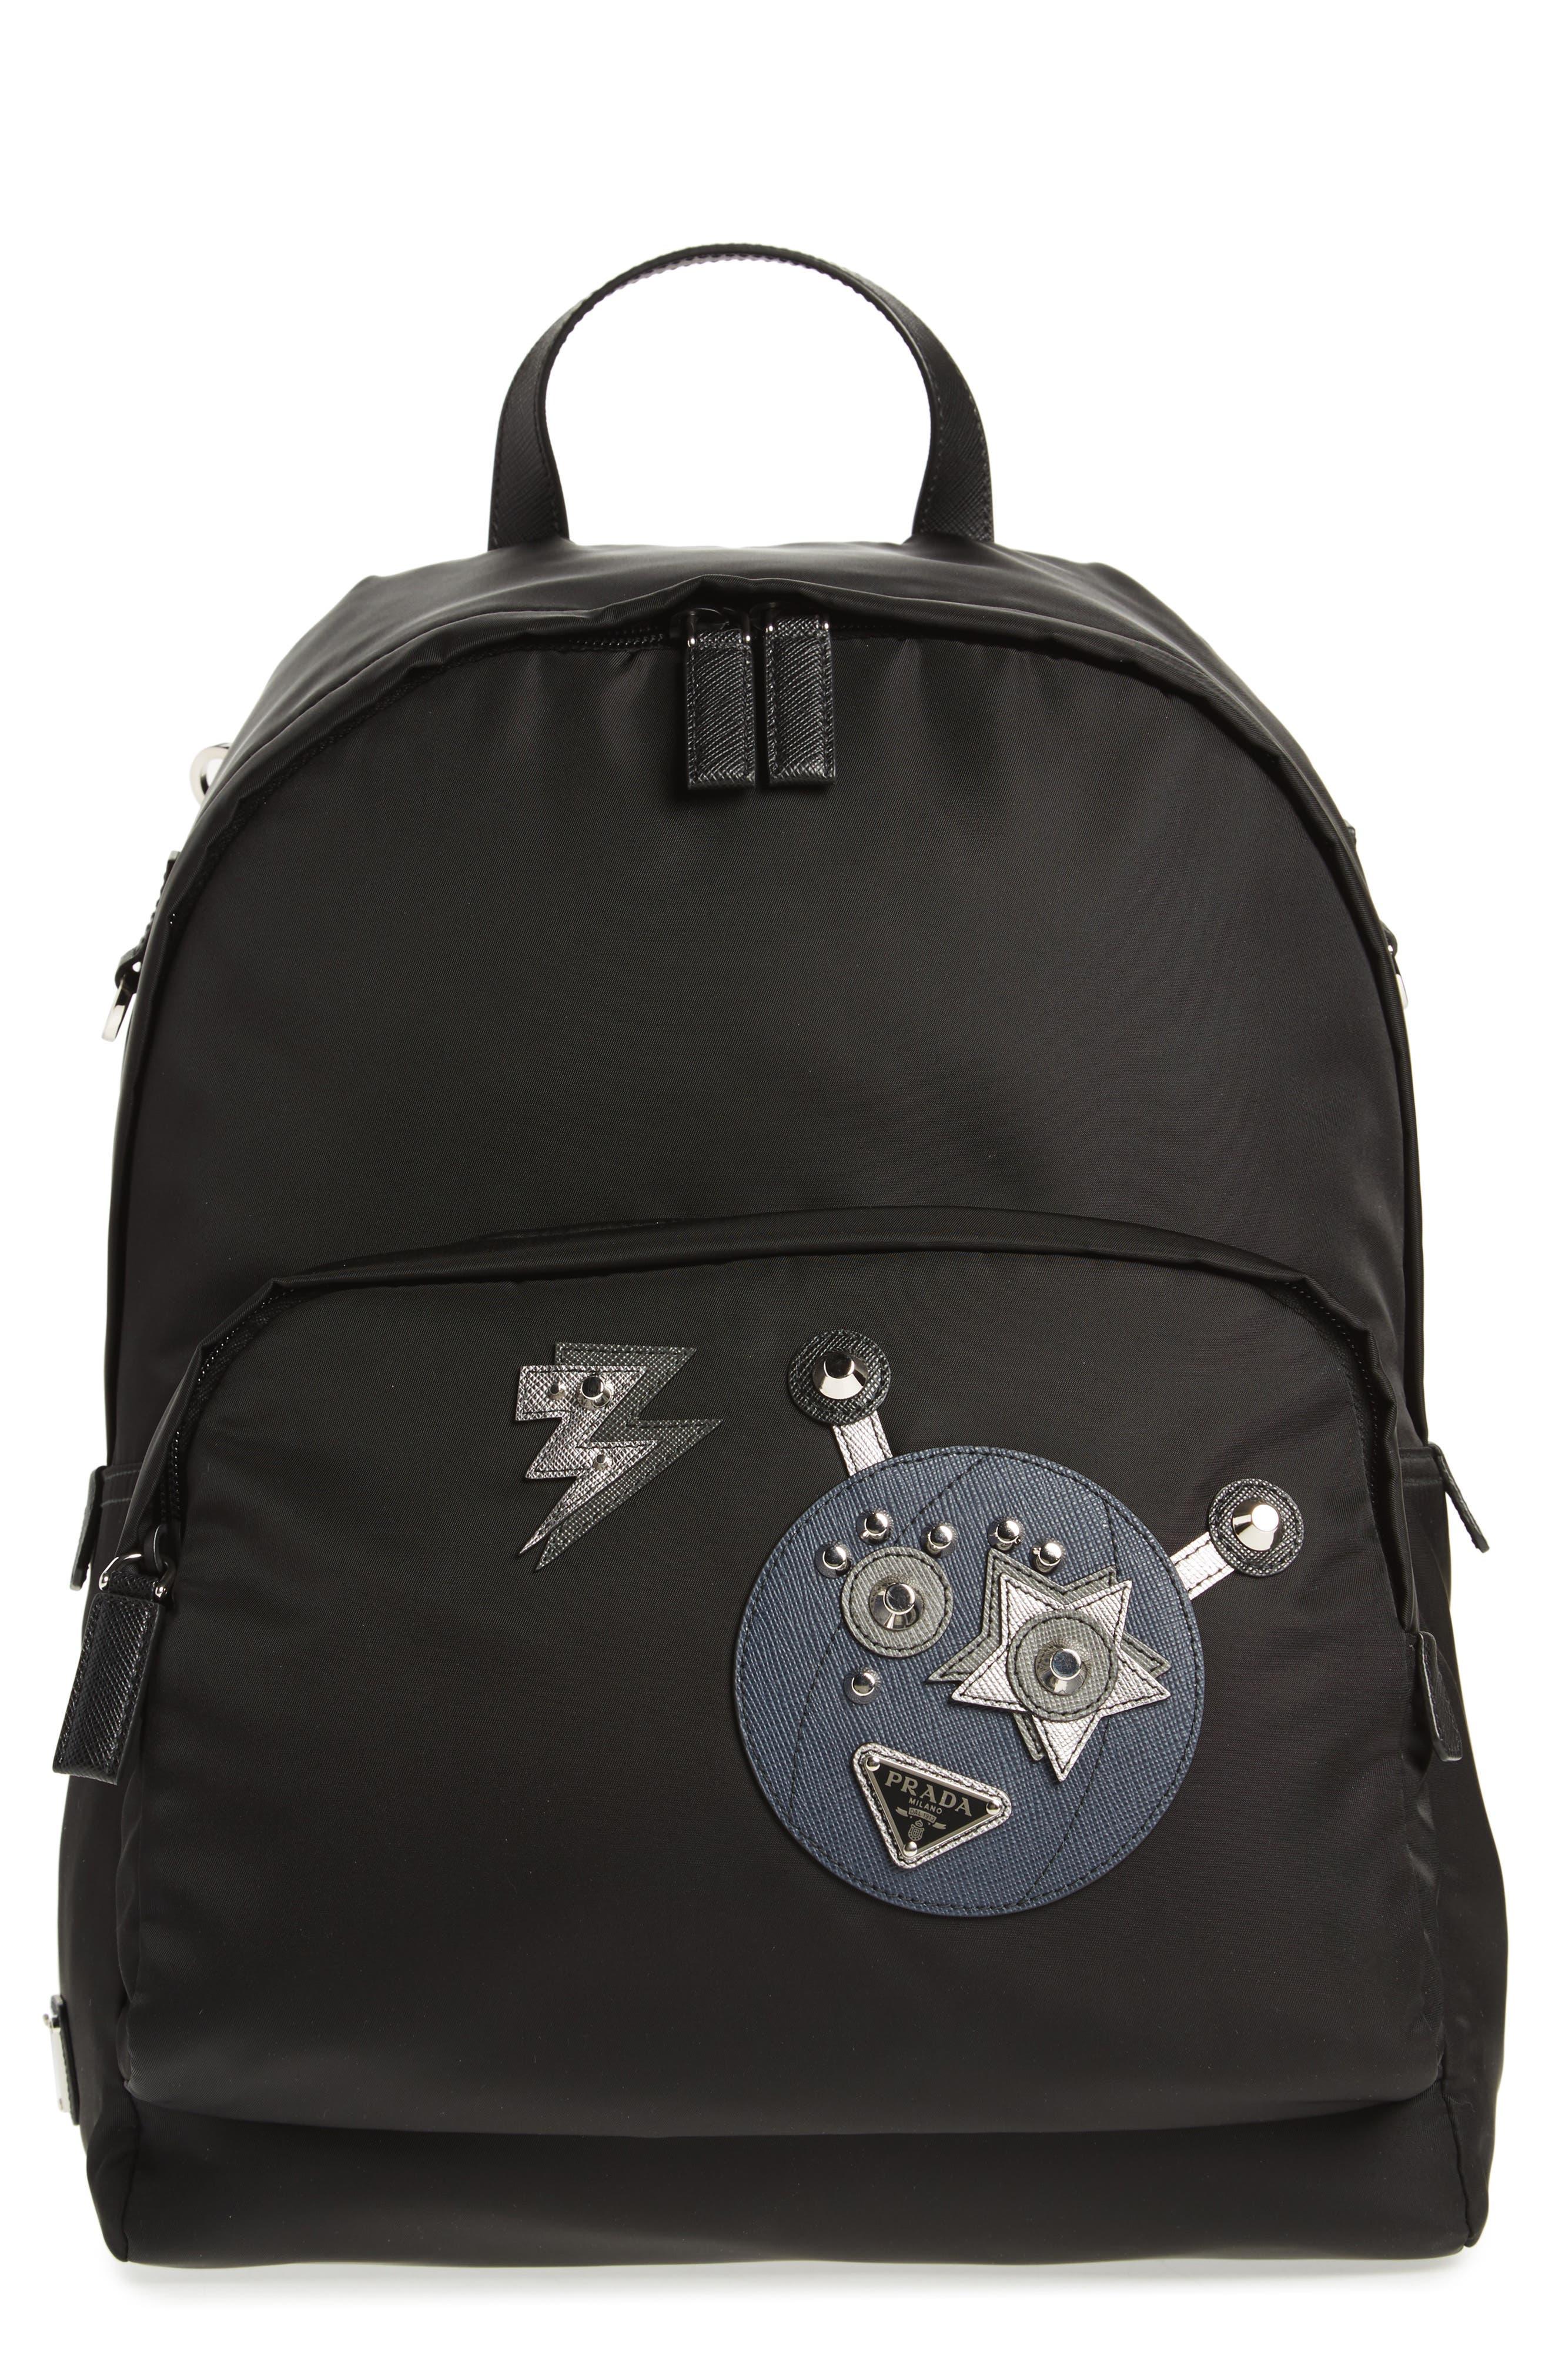 Robot Backpack,                             Main thumbnail 1, color,                             907